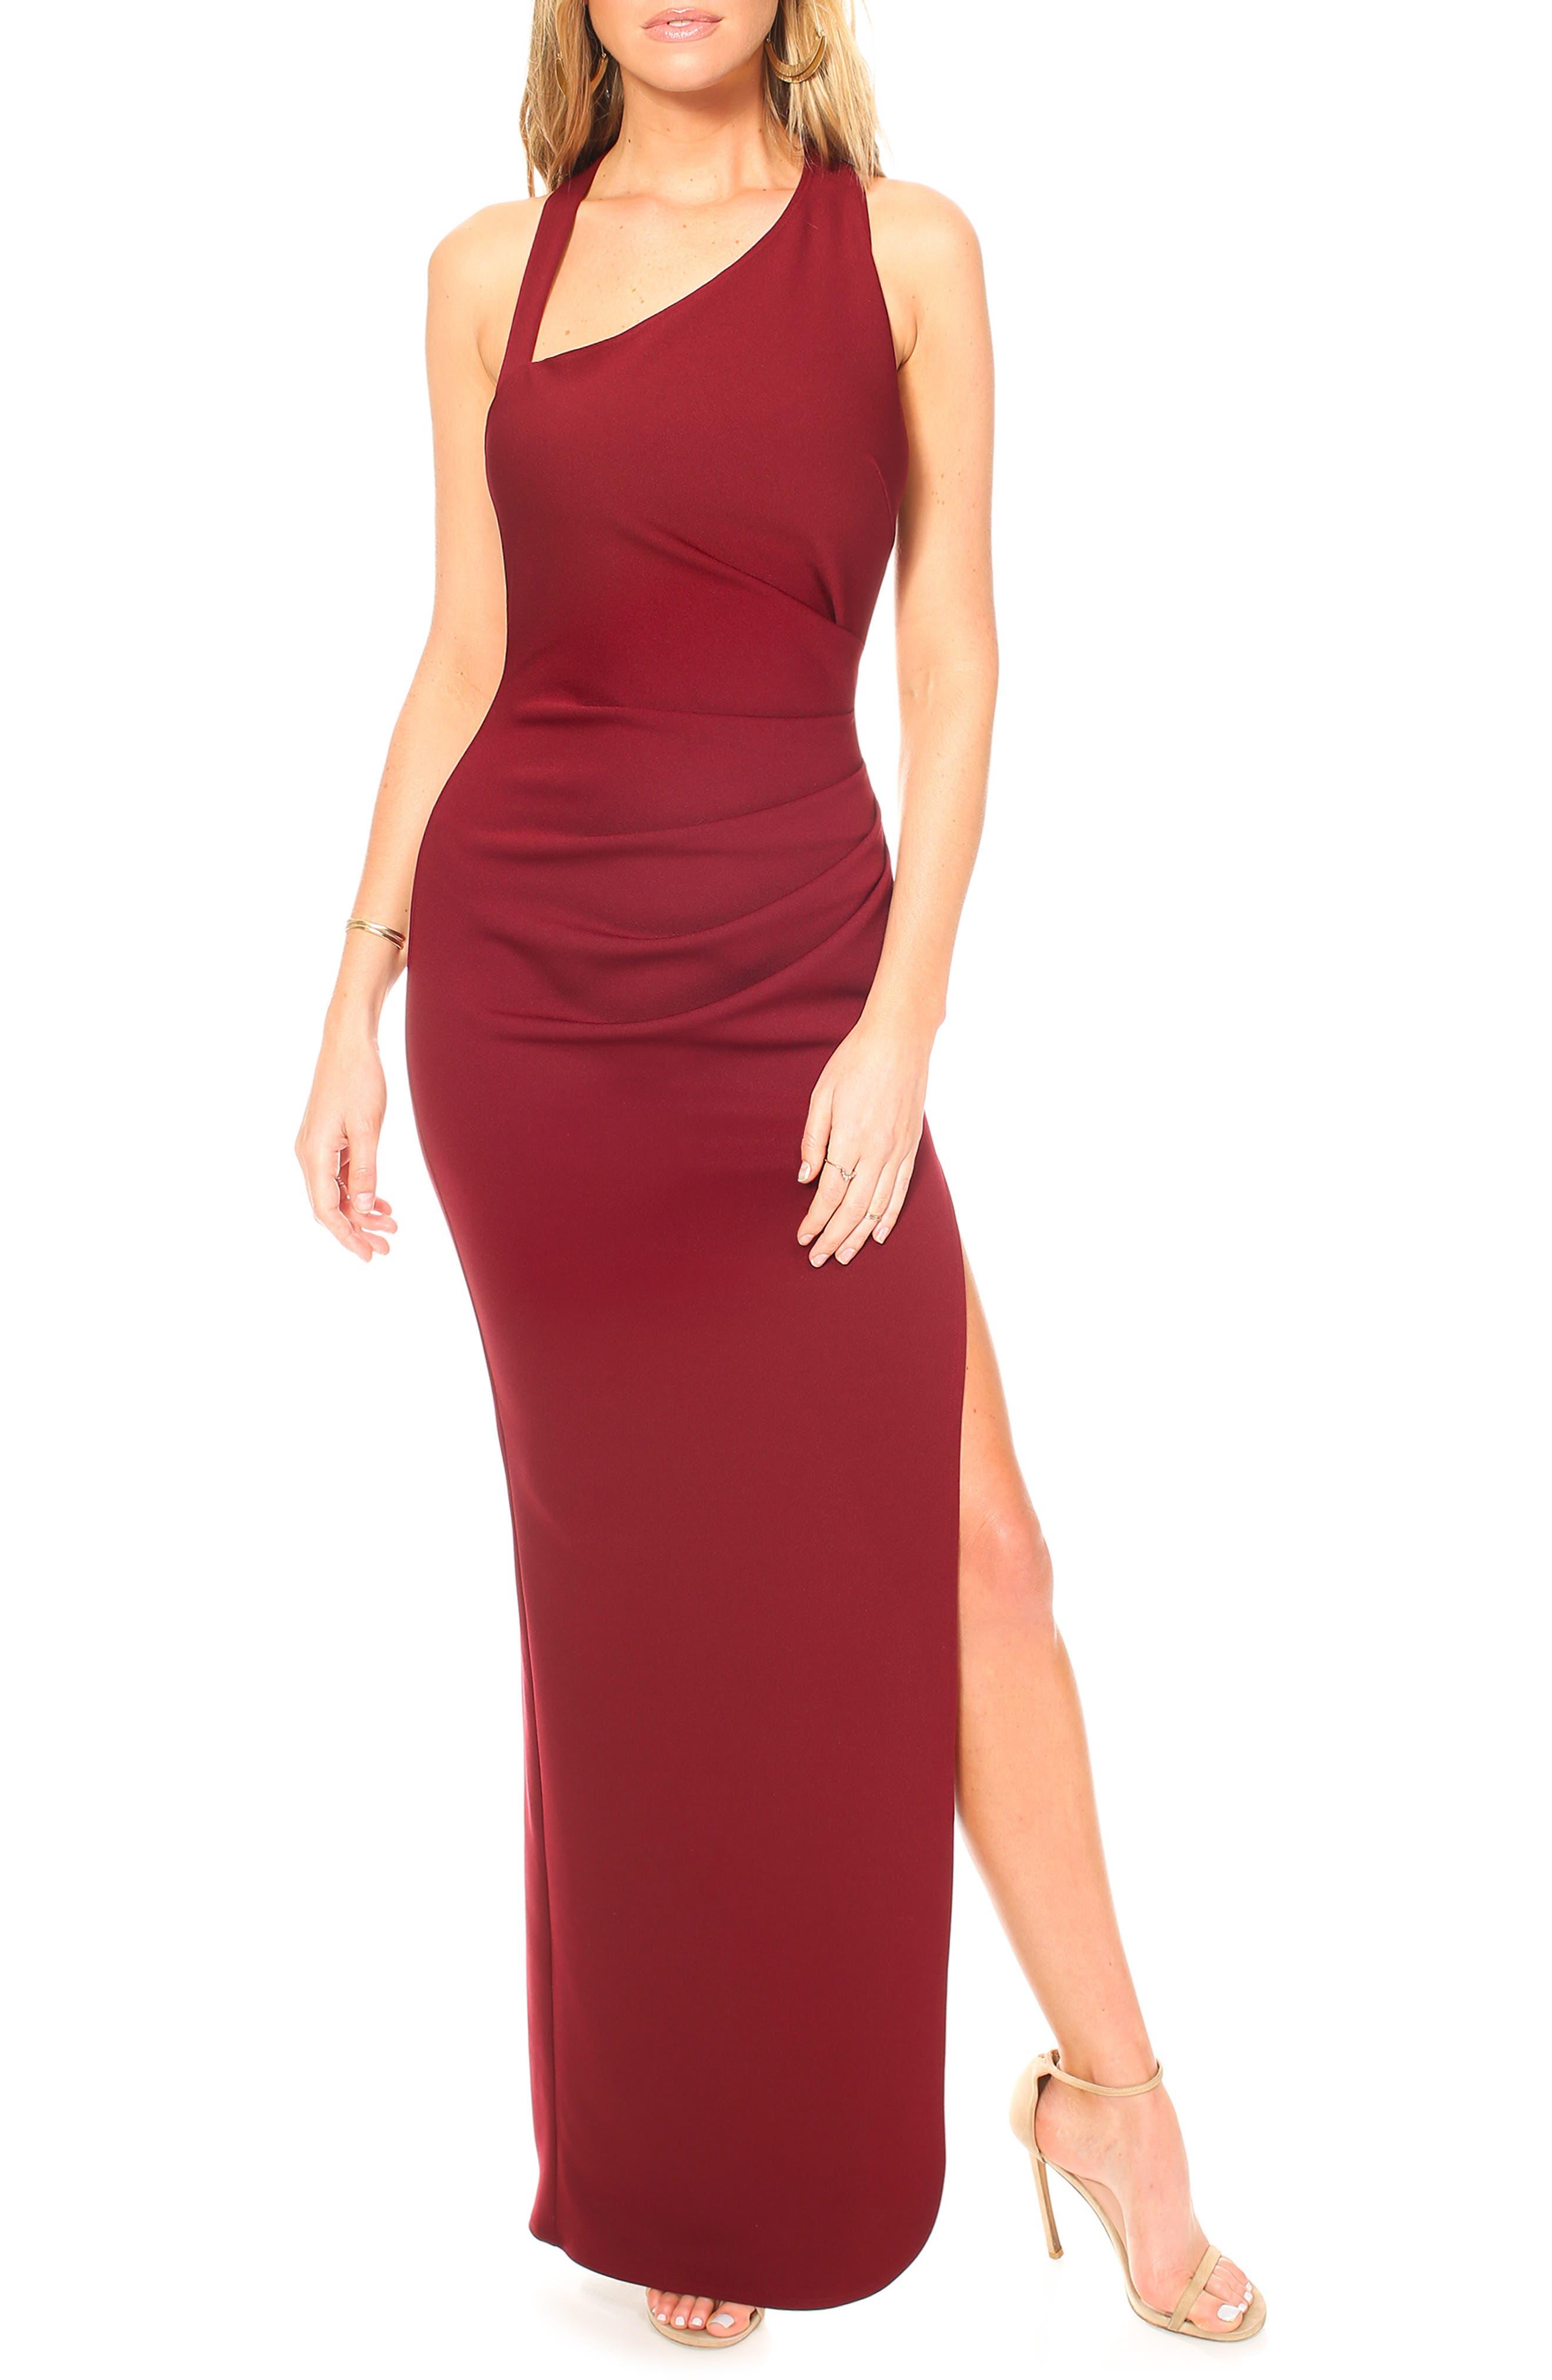 Katie May Teaser Asymmetrical Halter Gown, Burgundy